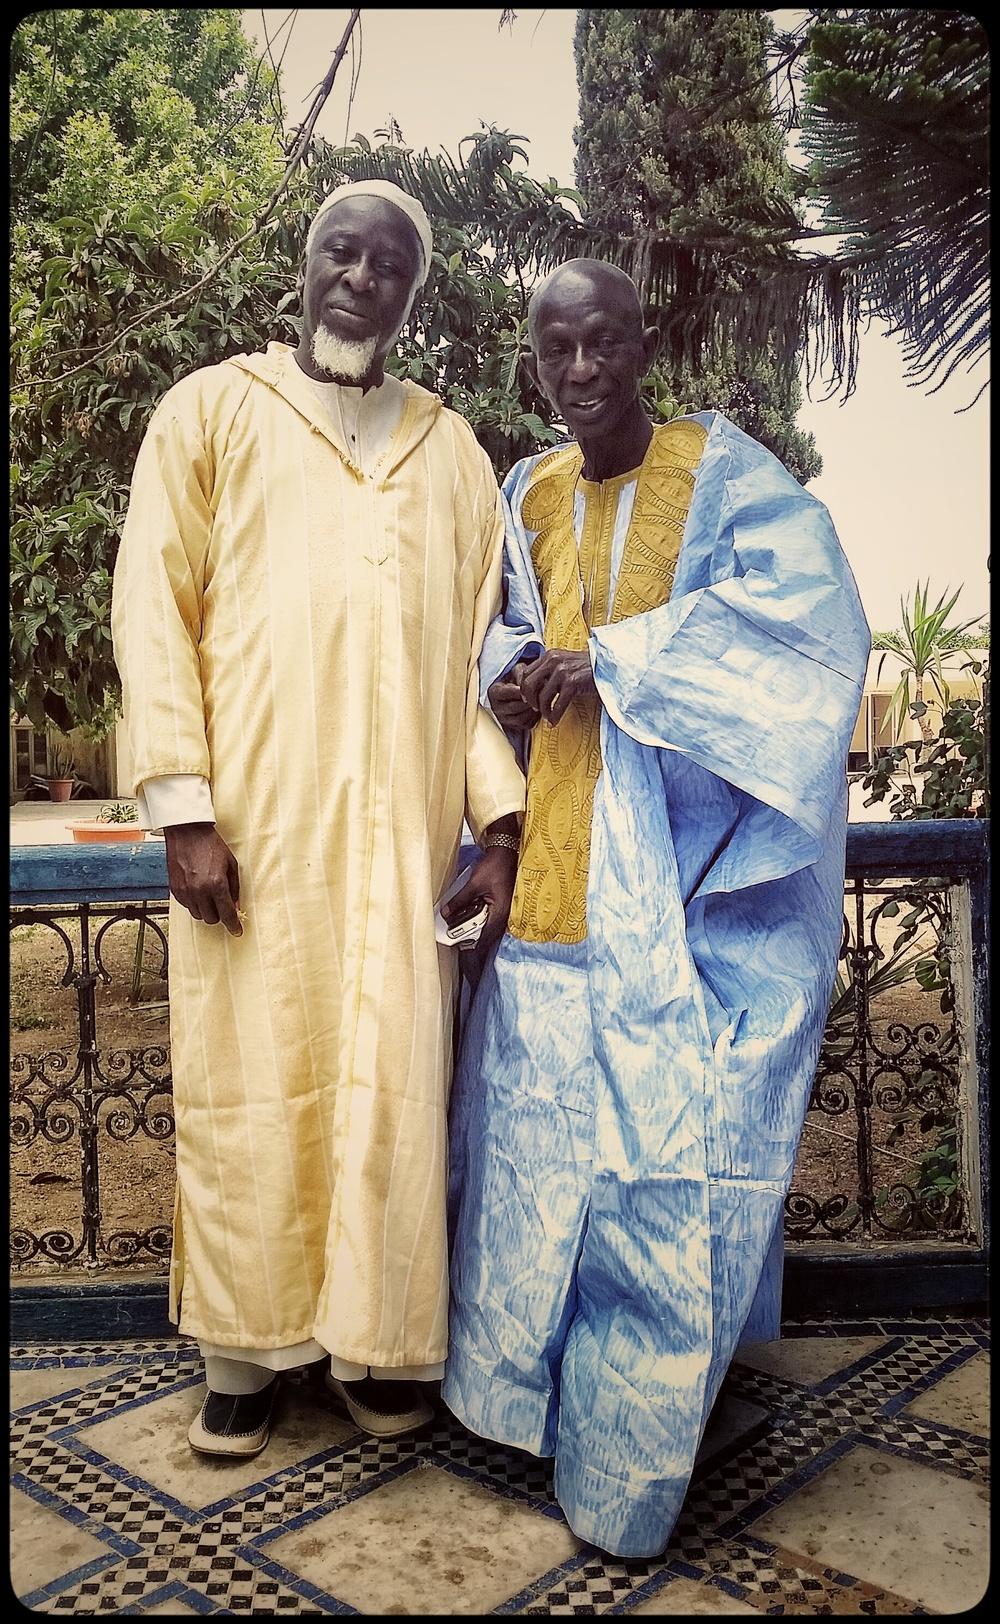 Doudou Ndiaye Rose et Imam Sy,22 mai 2015, Dar Tazi,Fès ©Edith